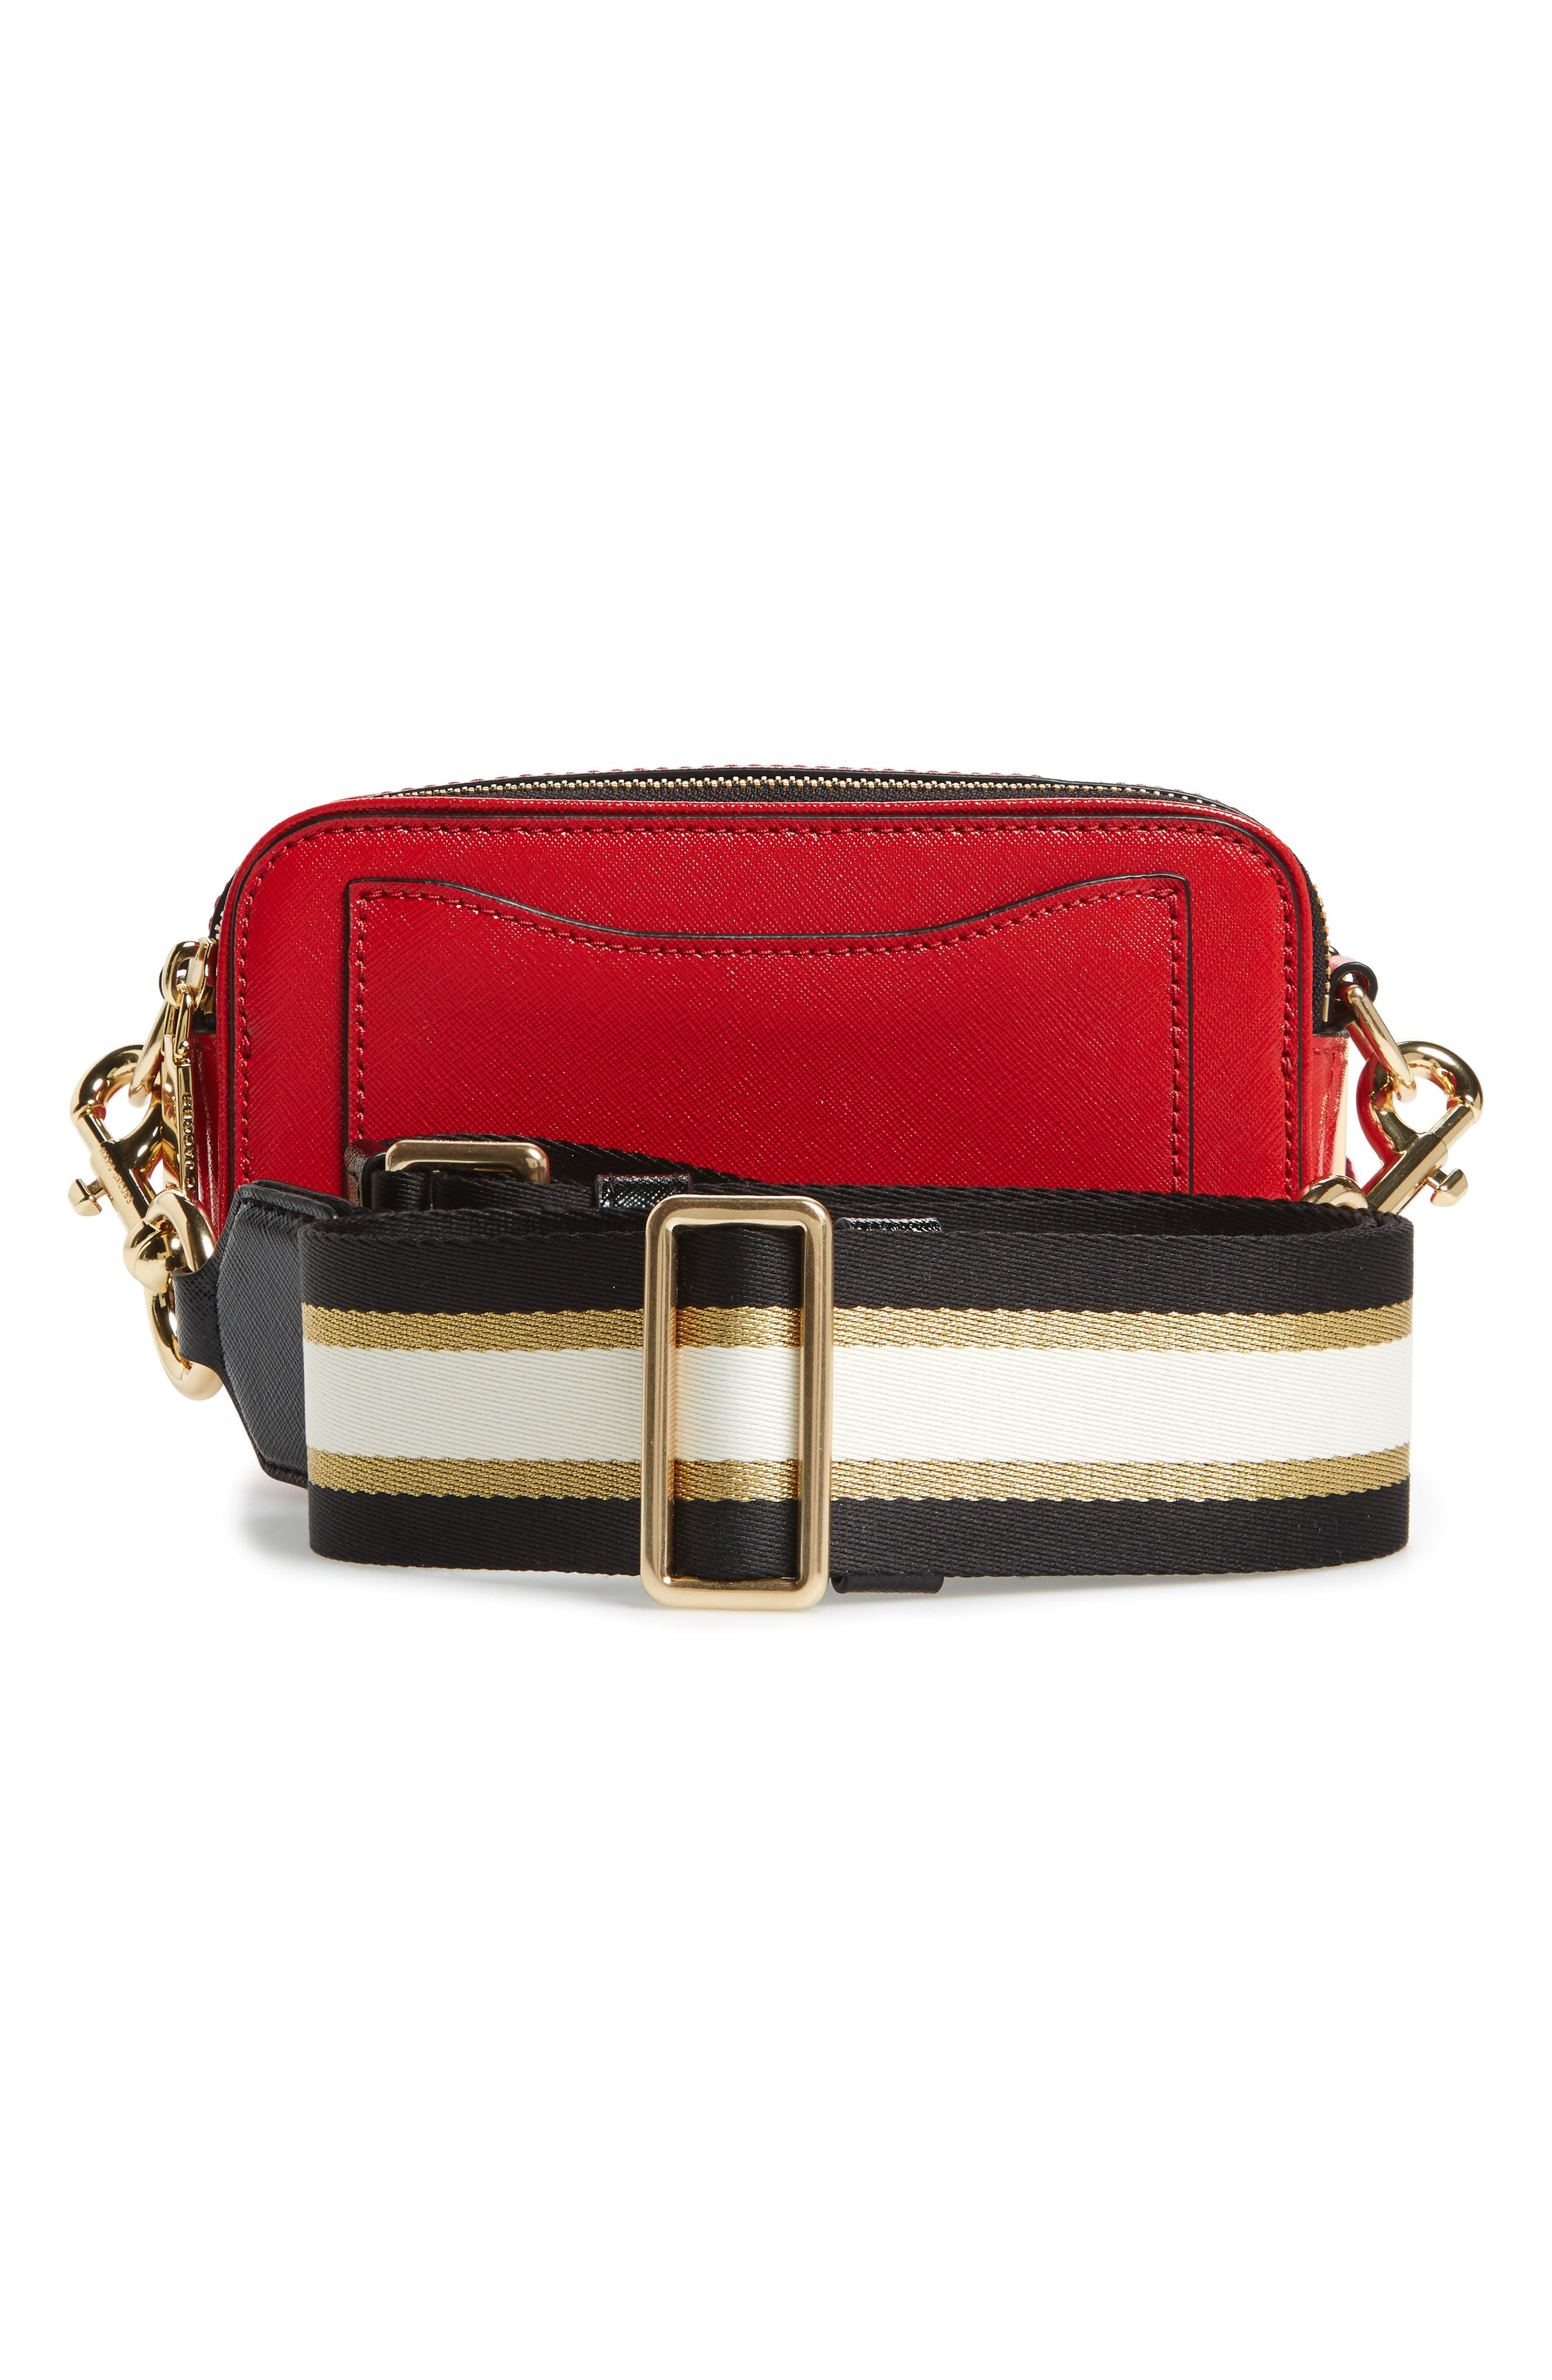 Snapshot Jacquard Crossbody Bag,                             Alternate thumbnail 3, color,                             RED